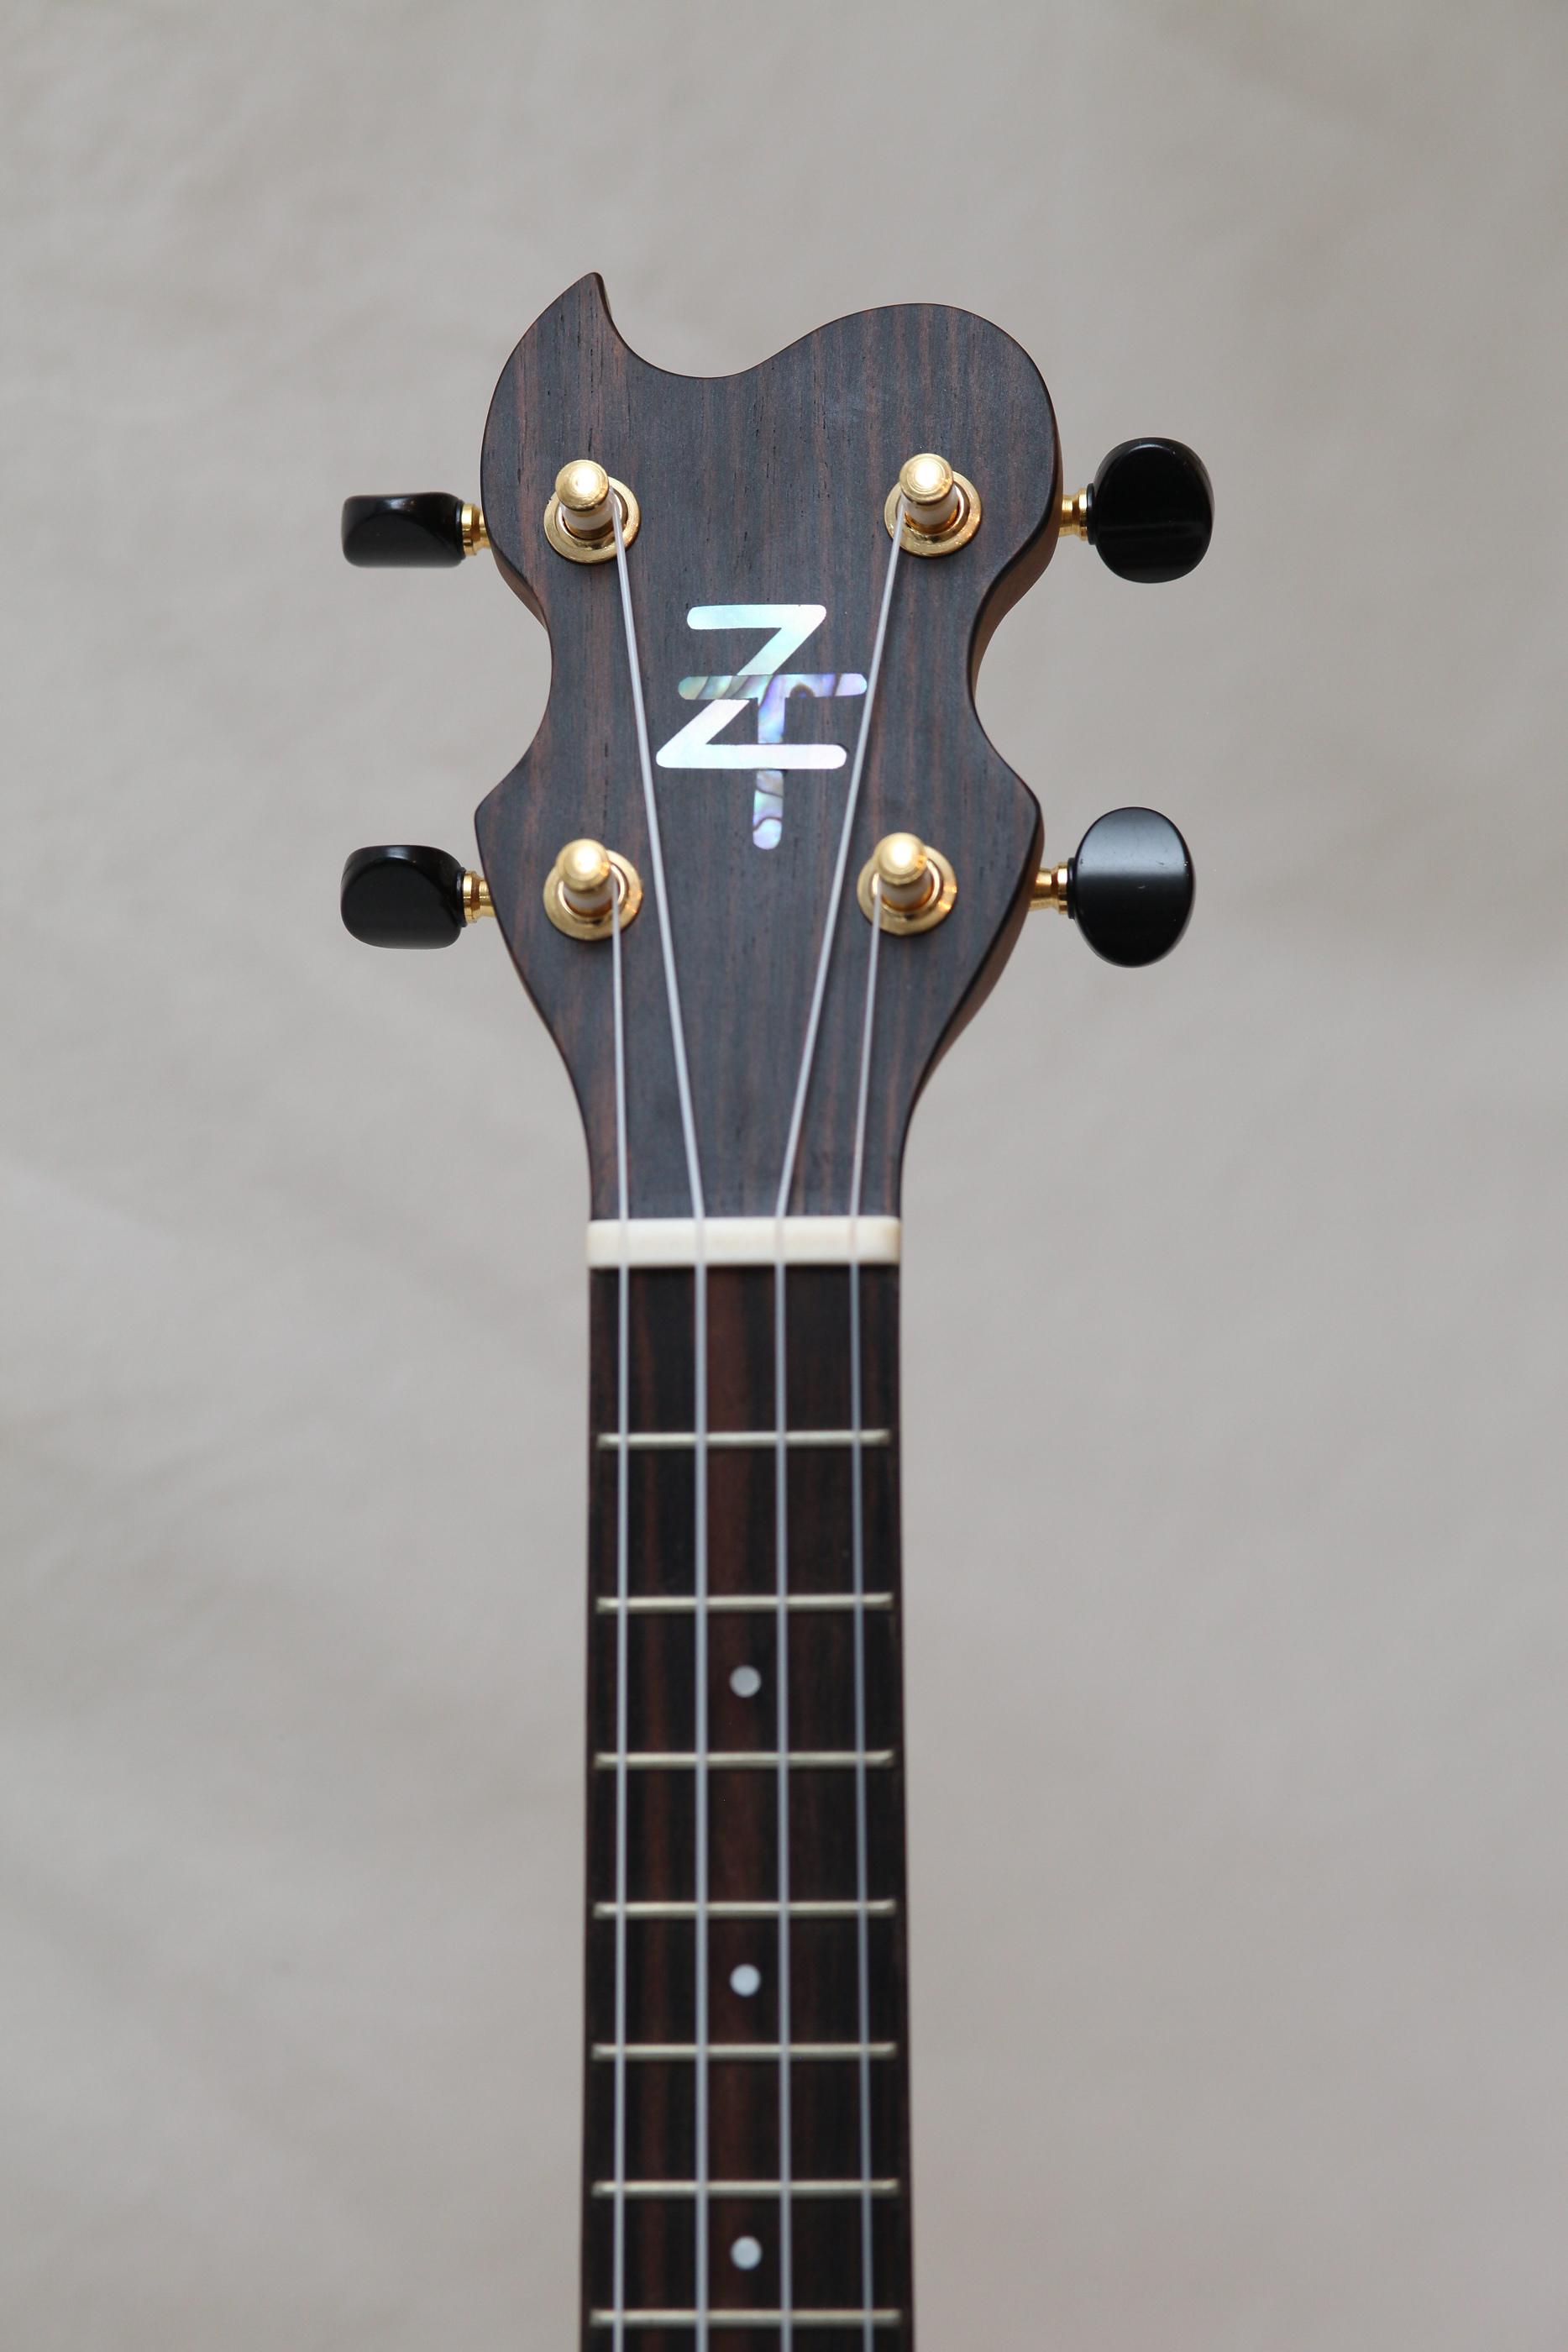 ZT Soprano Ukulele in Maple